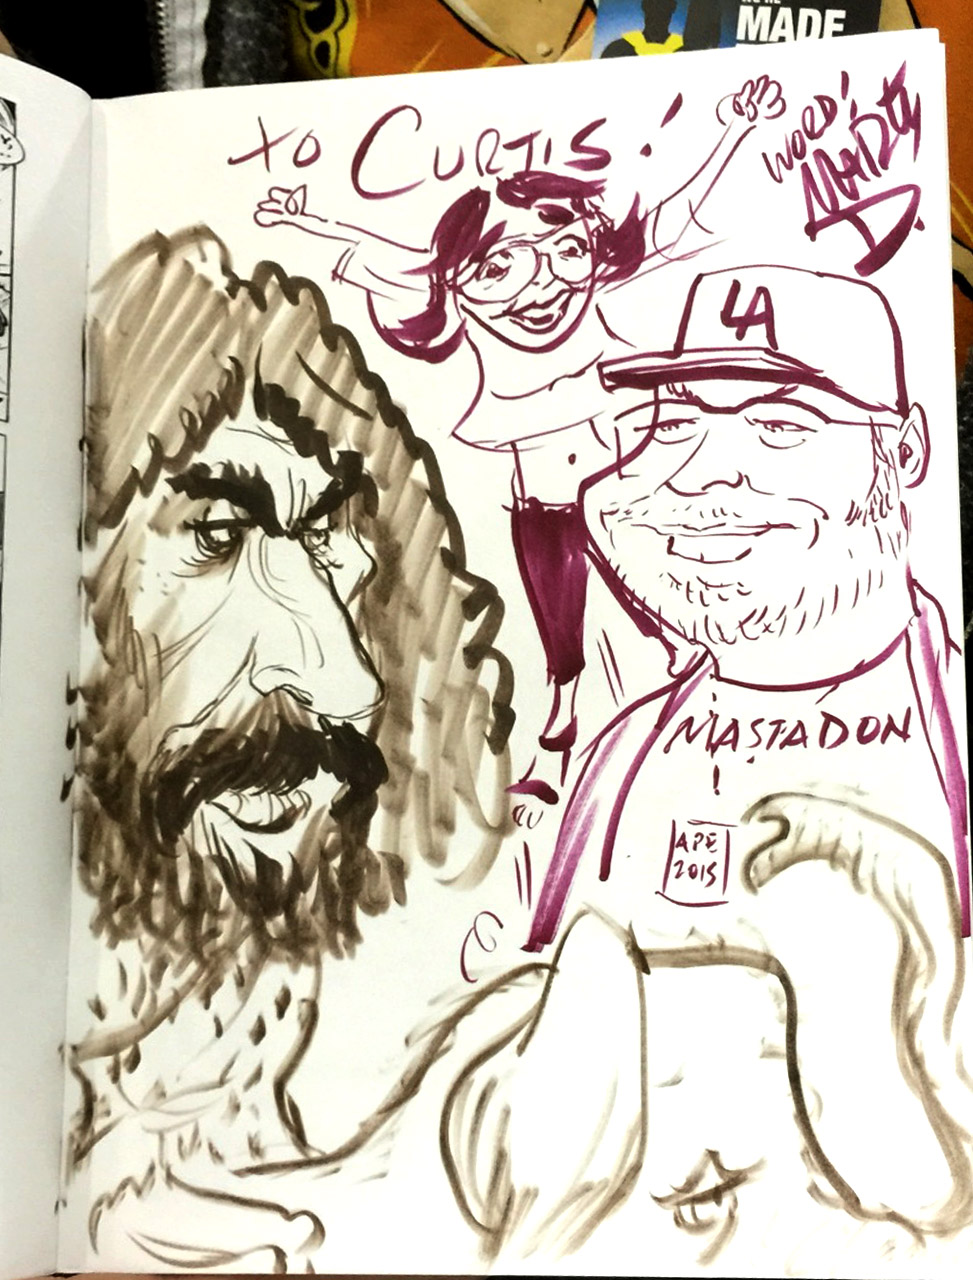 Zappa Mastadon